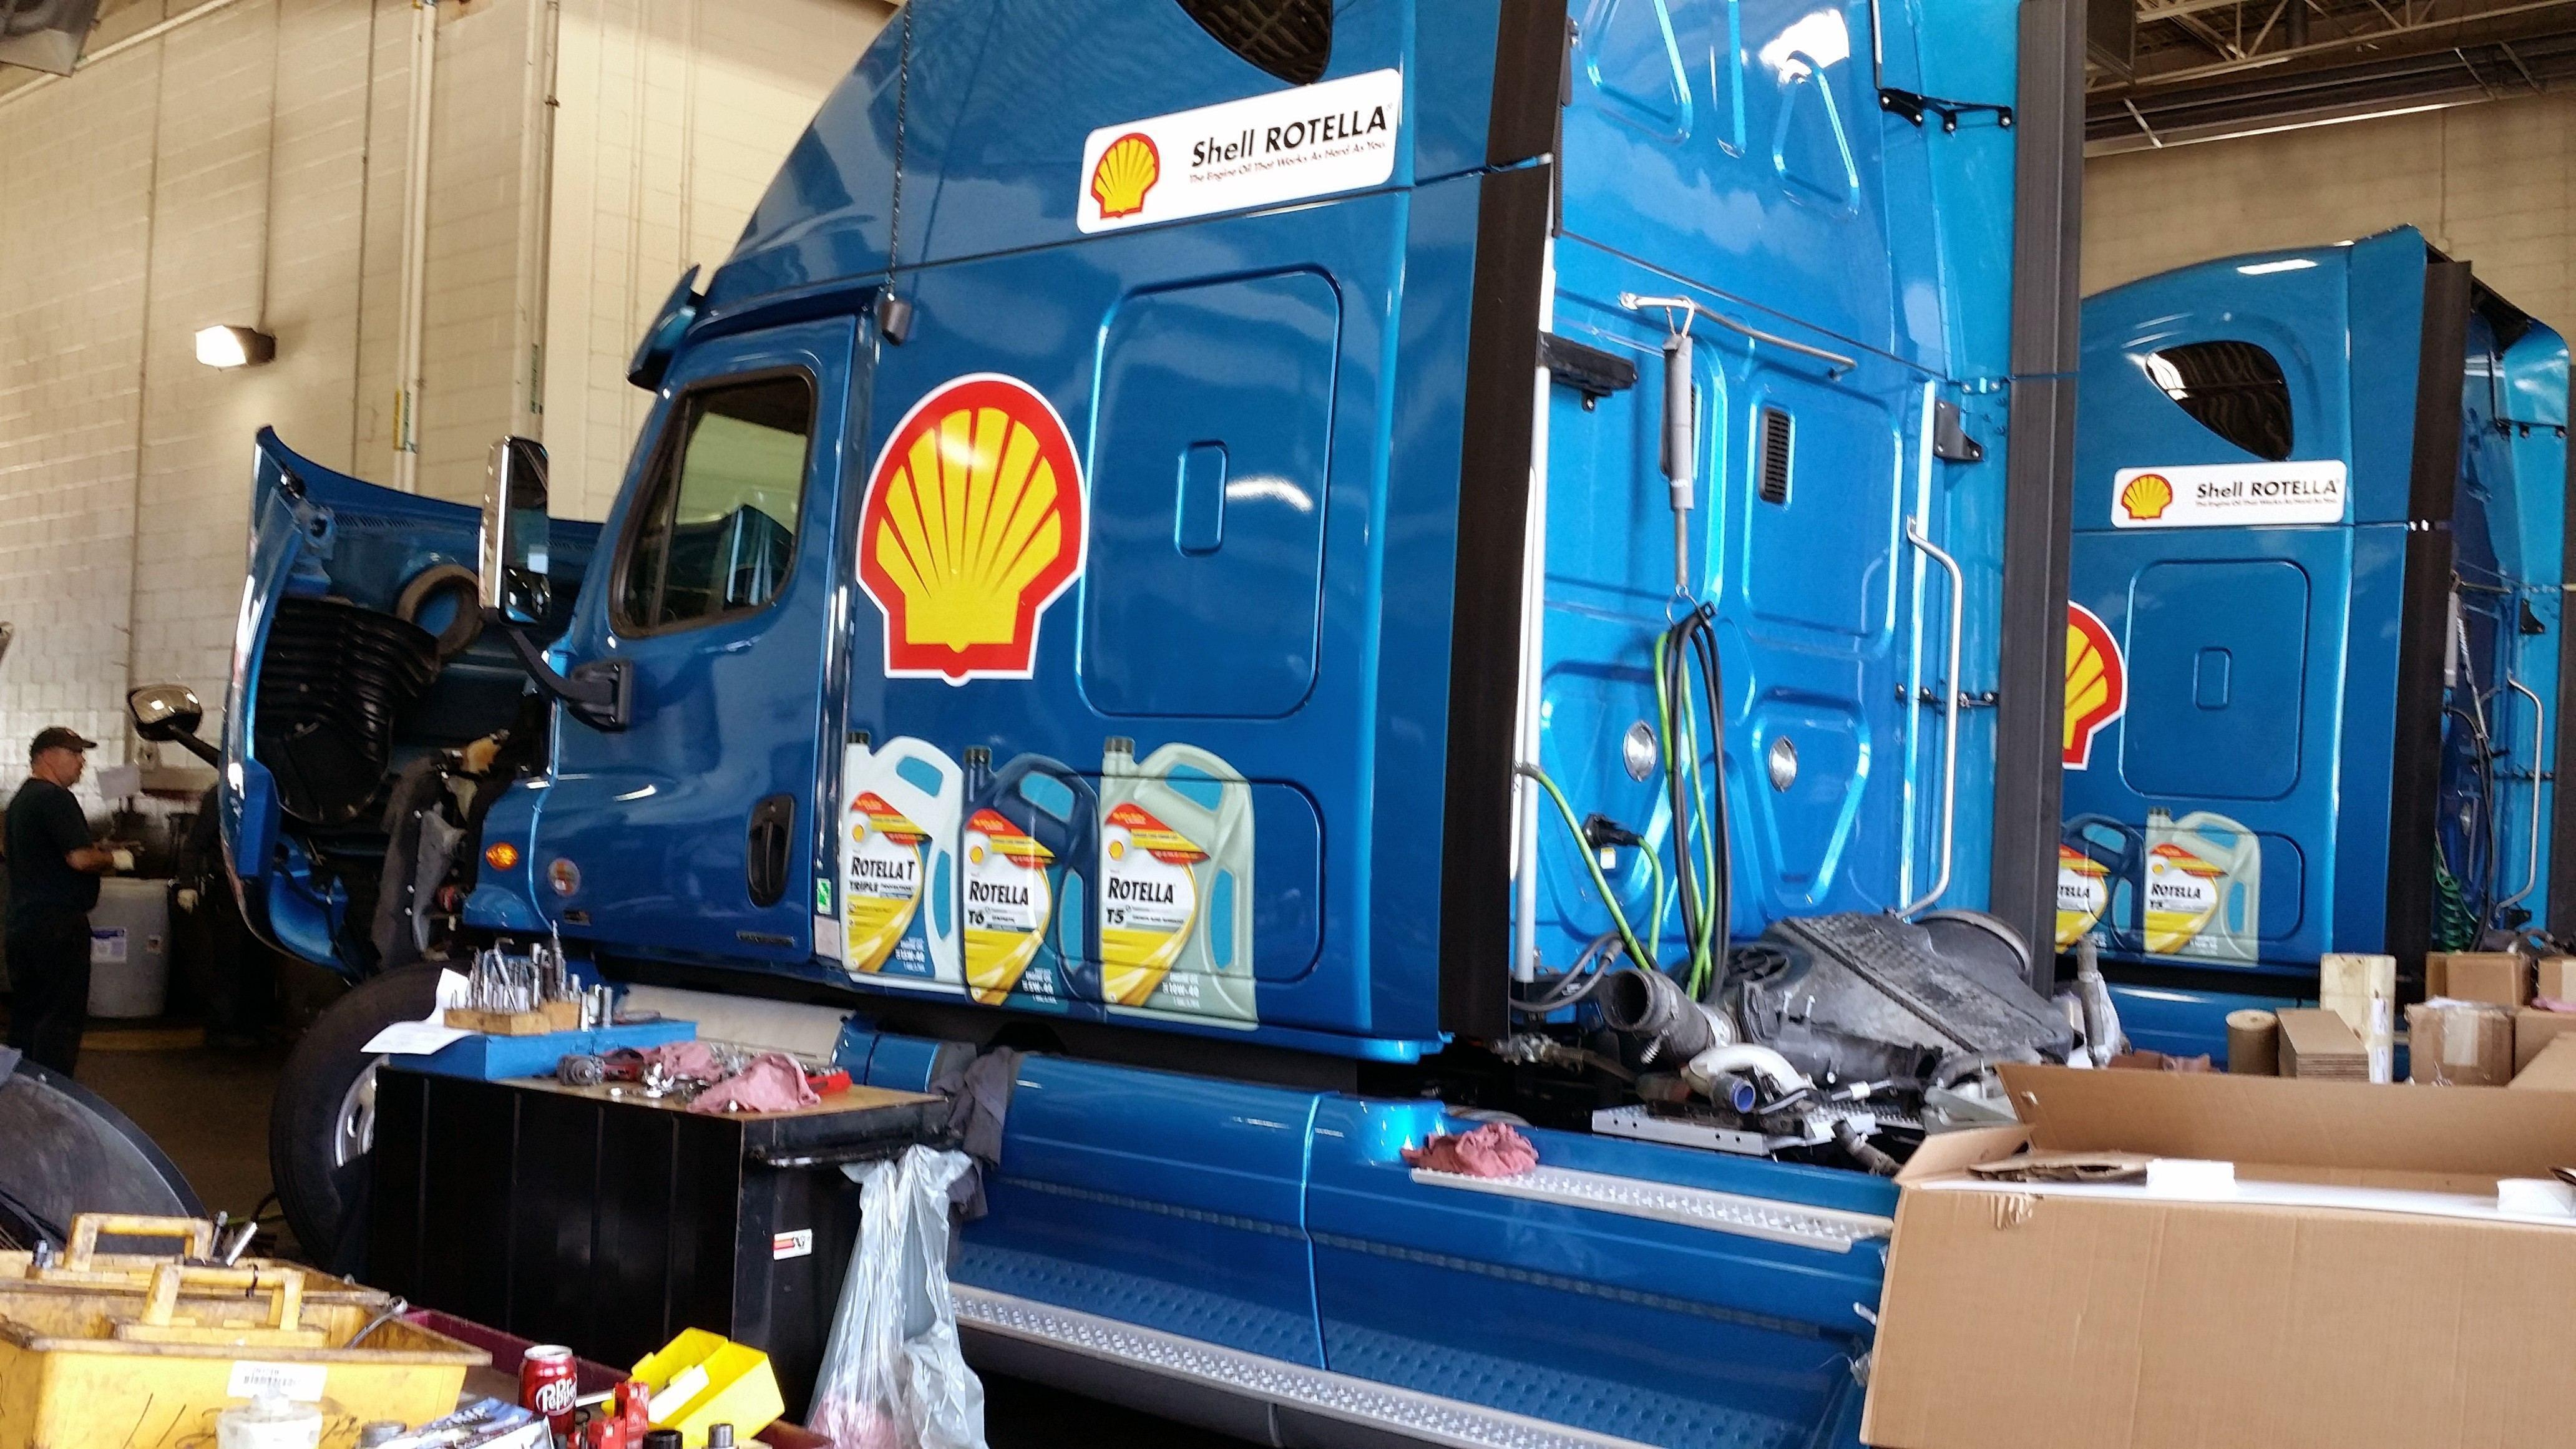 Shell Rotella: Modern oils extend drain intervals, now